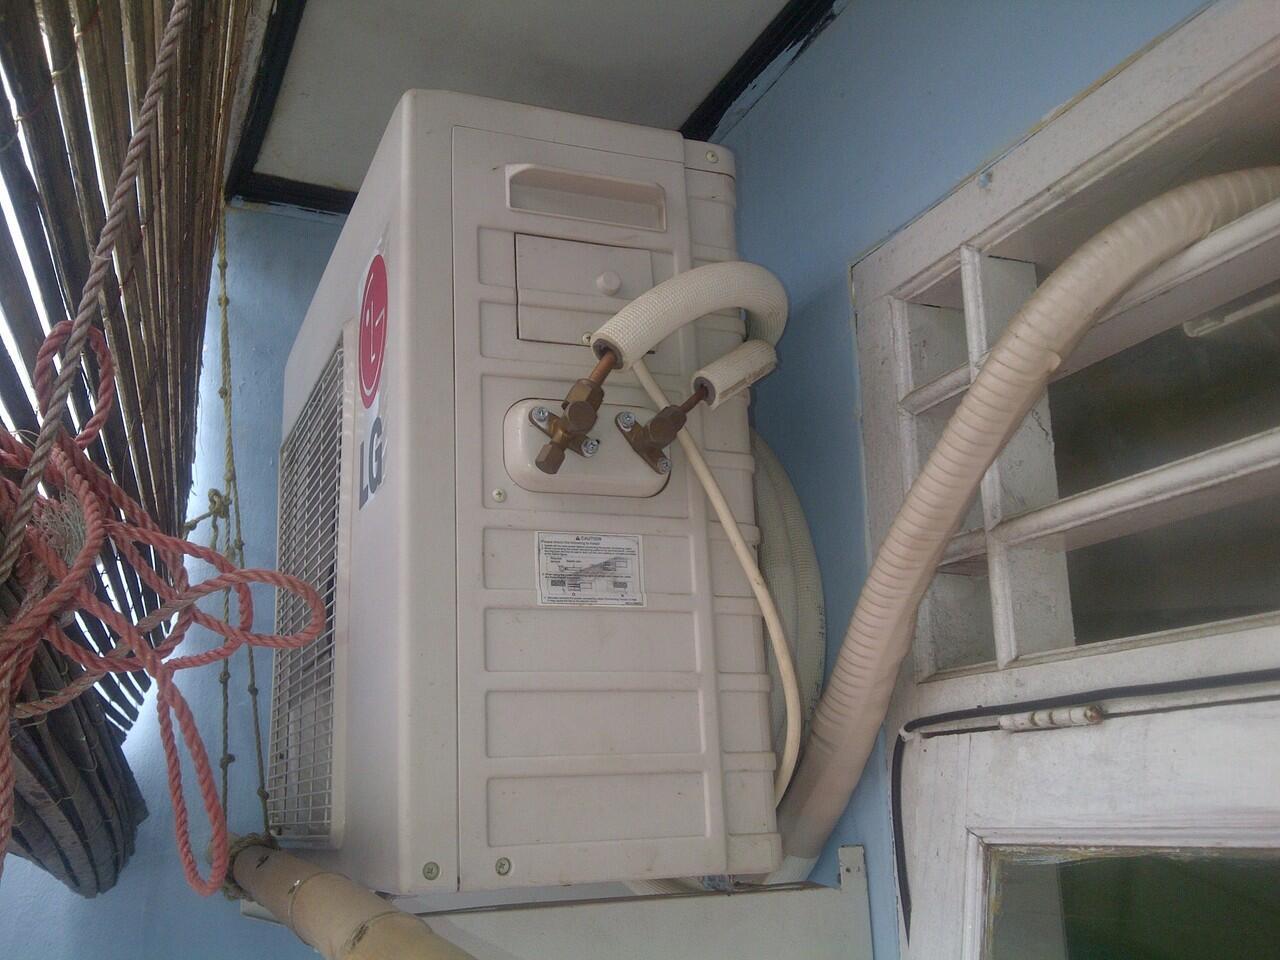 AC LG TERMINATOR 1PK anti nyamuk